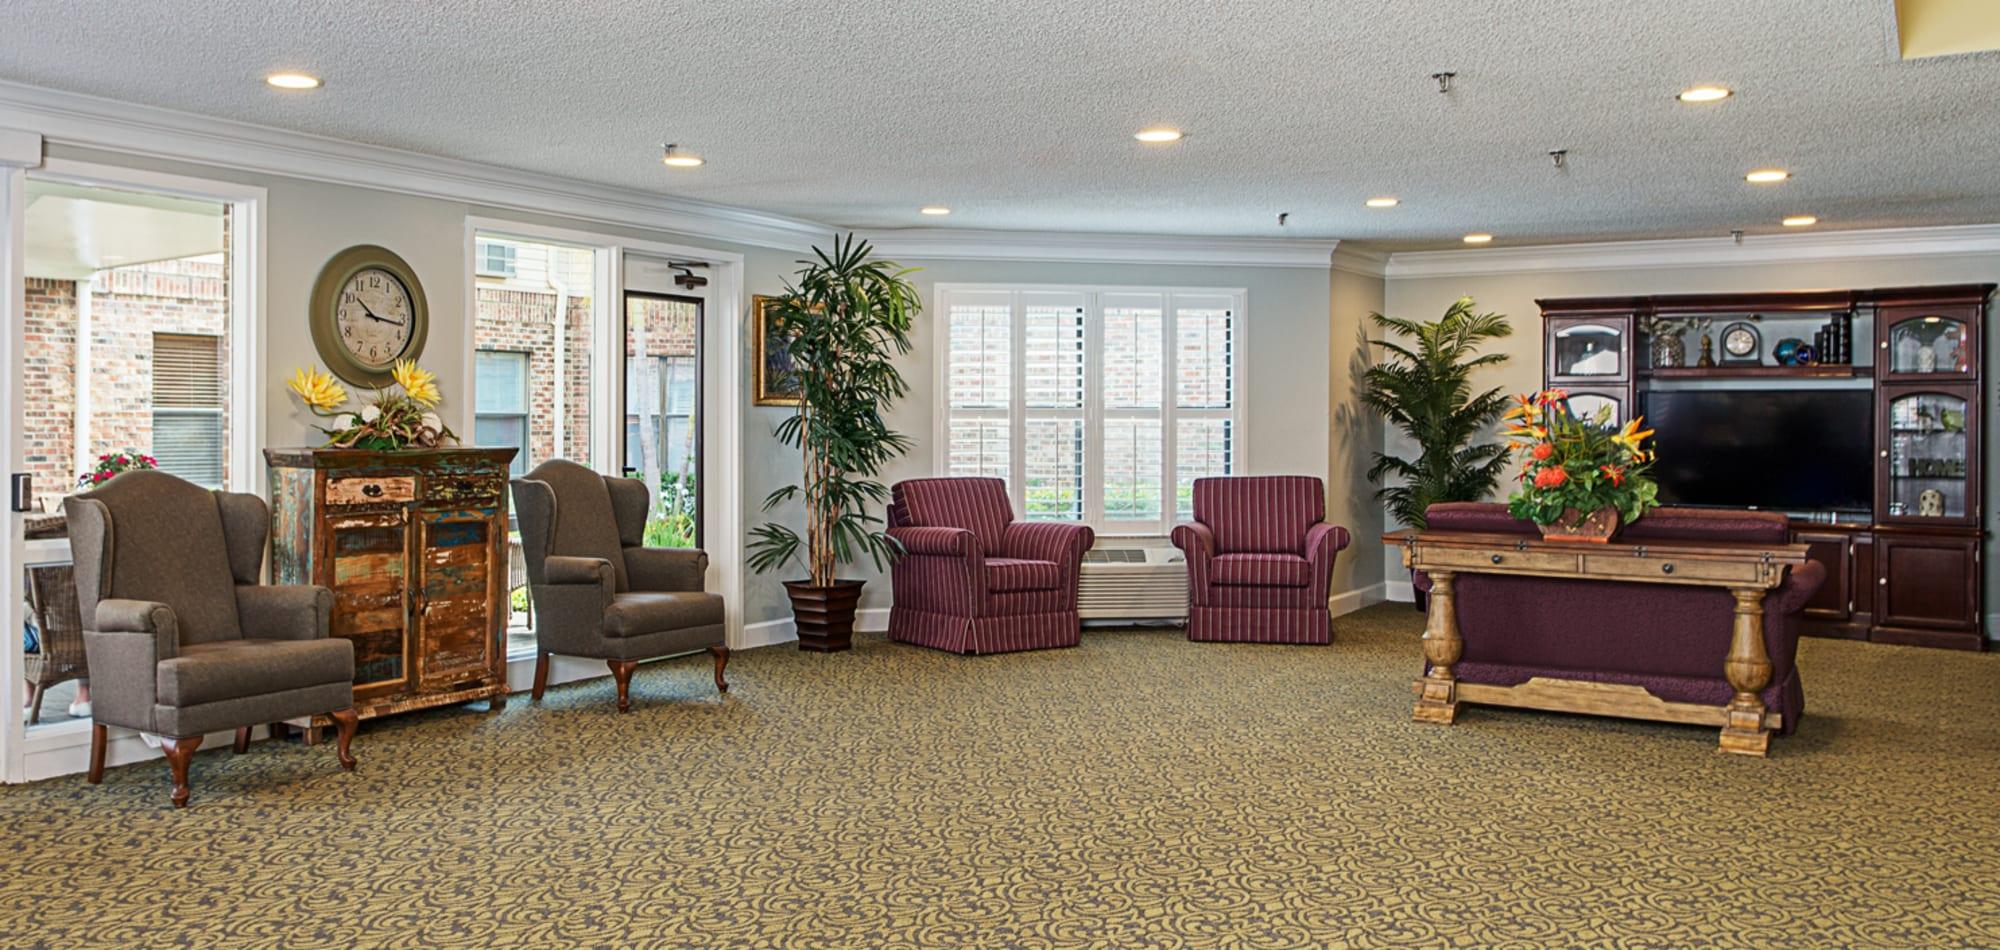 Grand Villa of Ormond Beach in Florida senior living